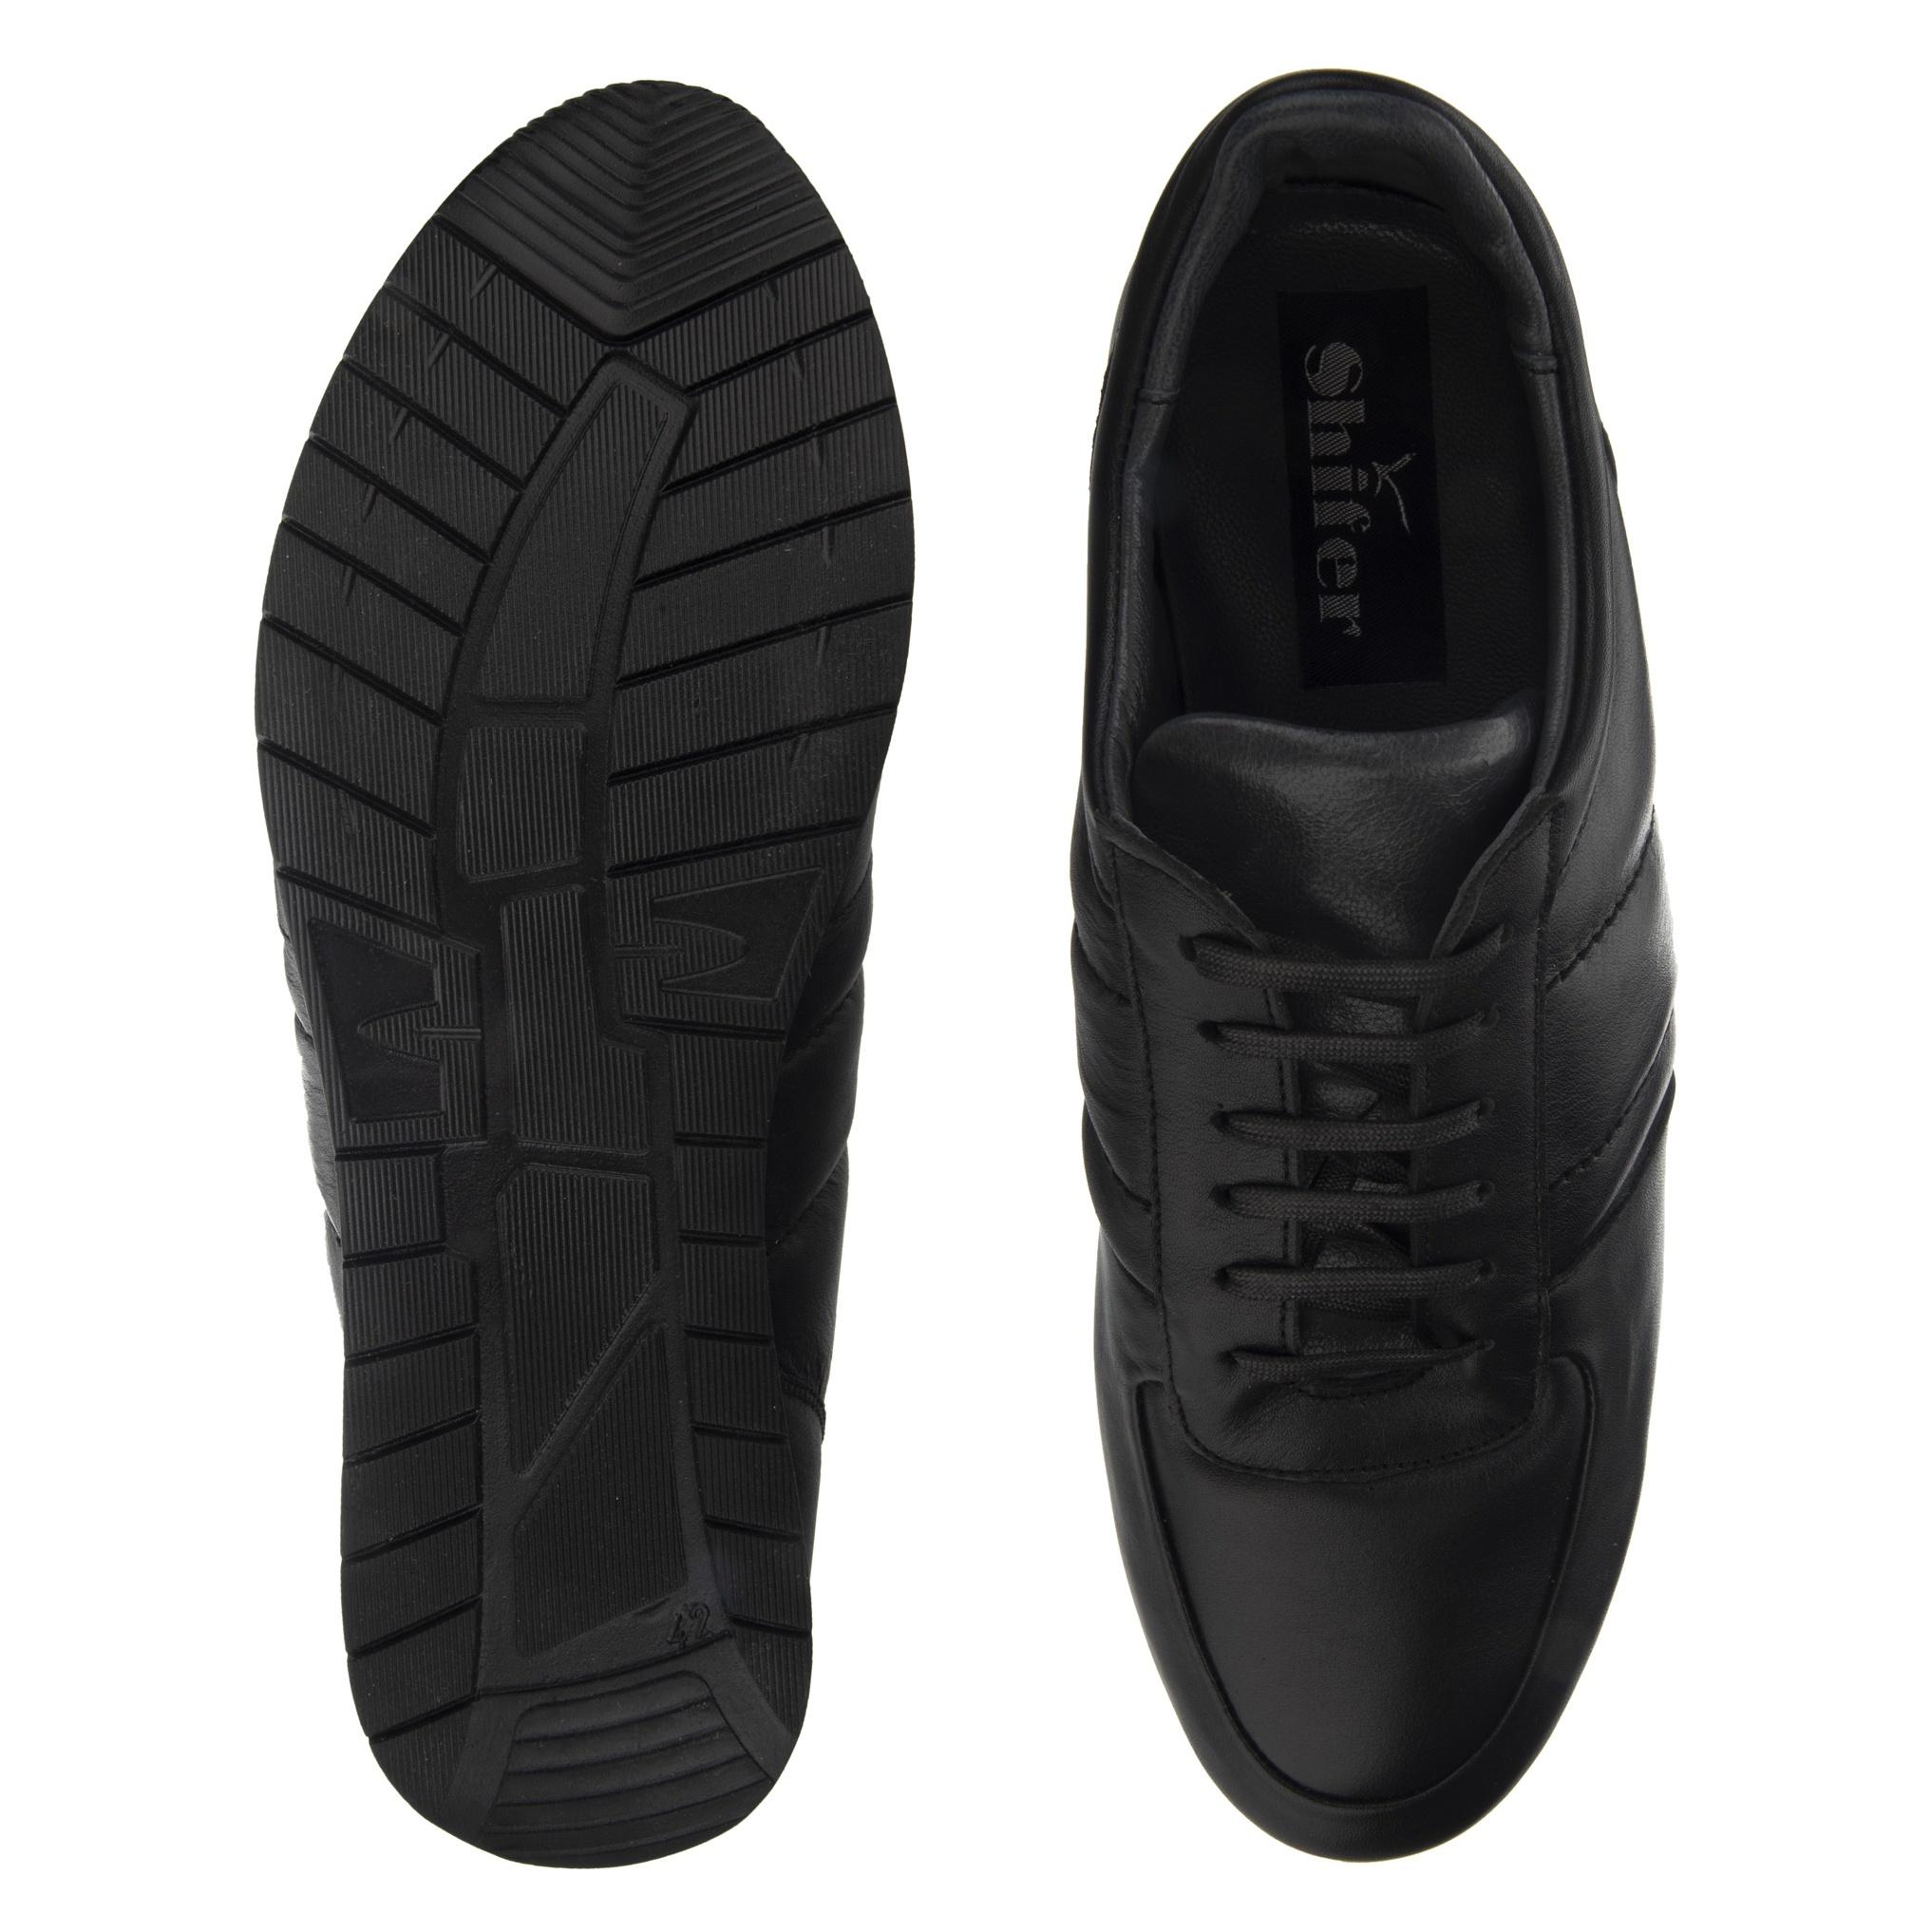 کفش روزمره مردانه شیفر مدل 7241A-101